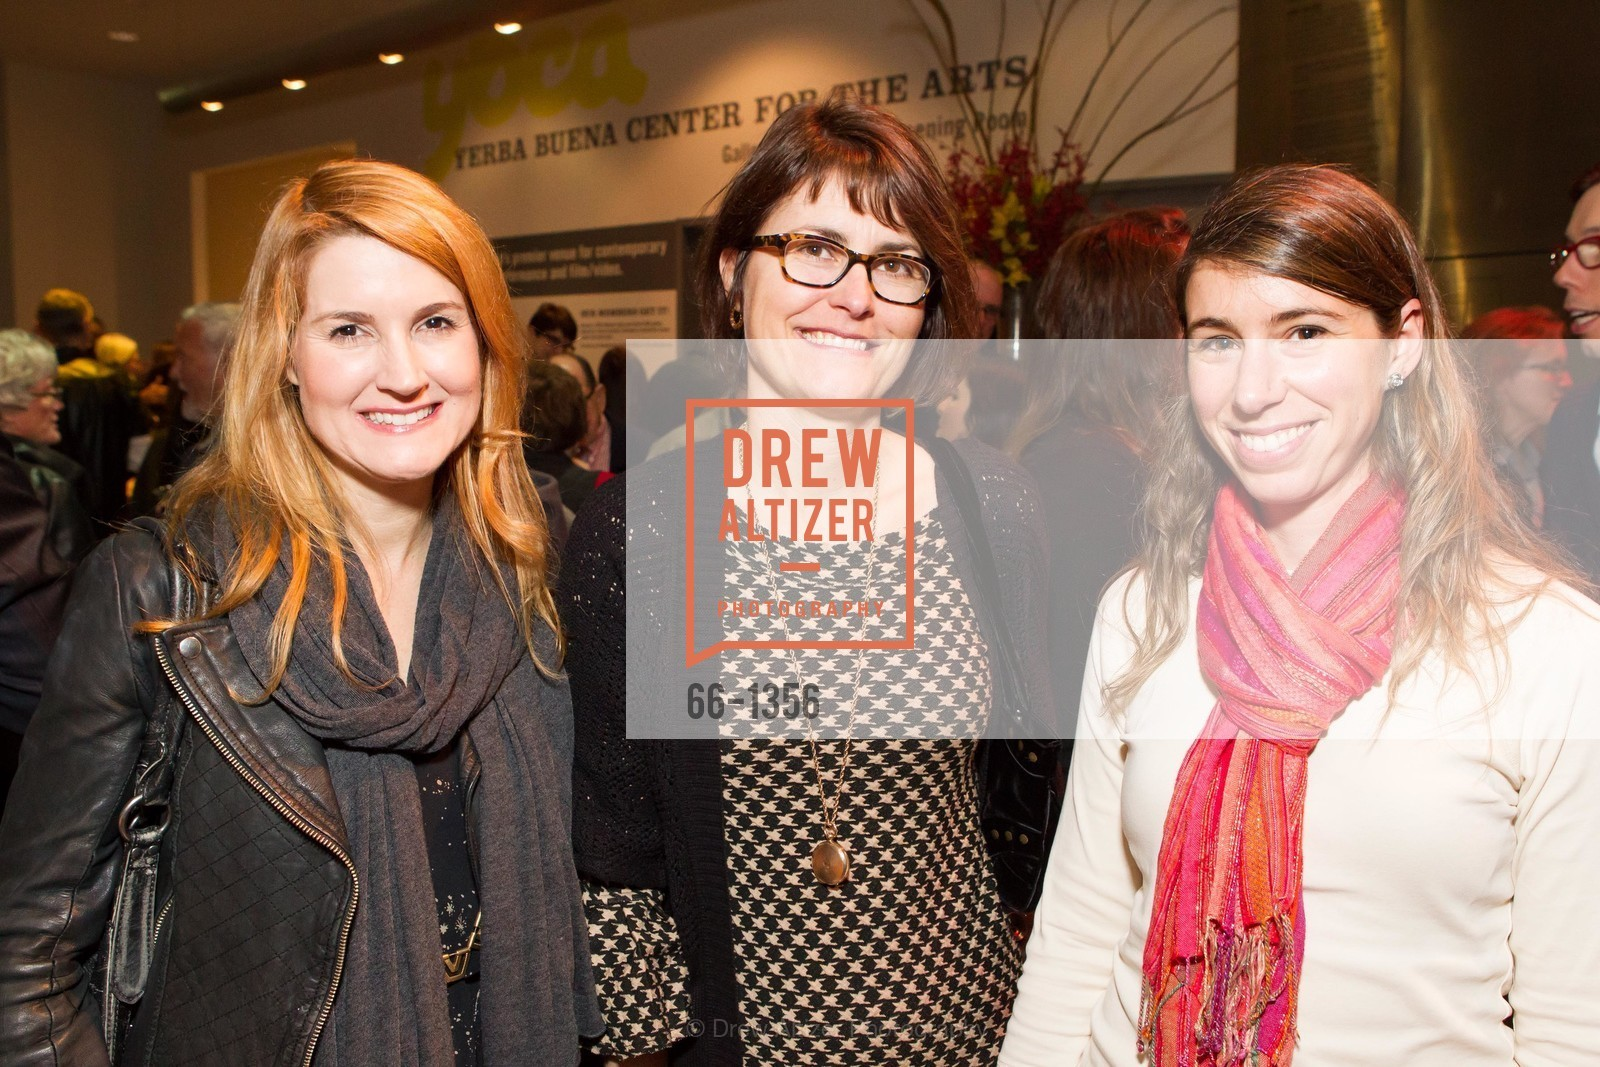 Erin O'Toole, Andrea Hackman, Photo #66-1356